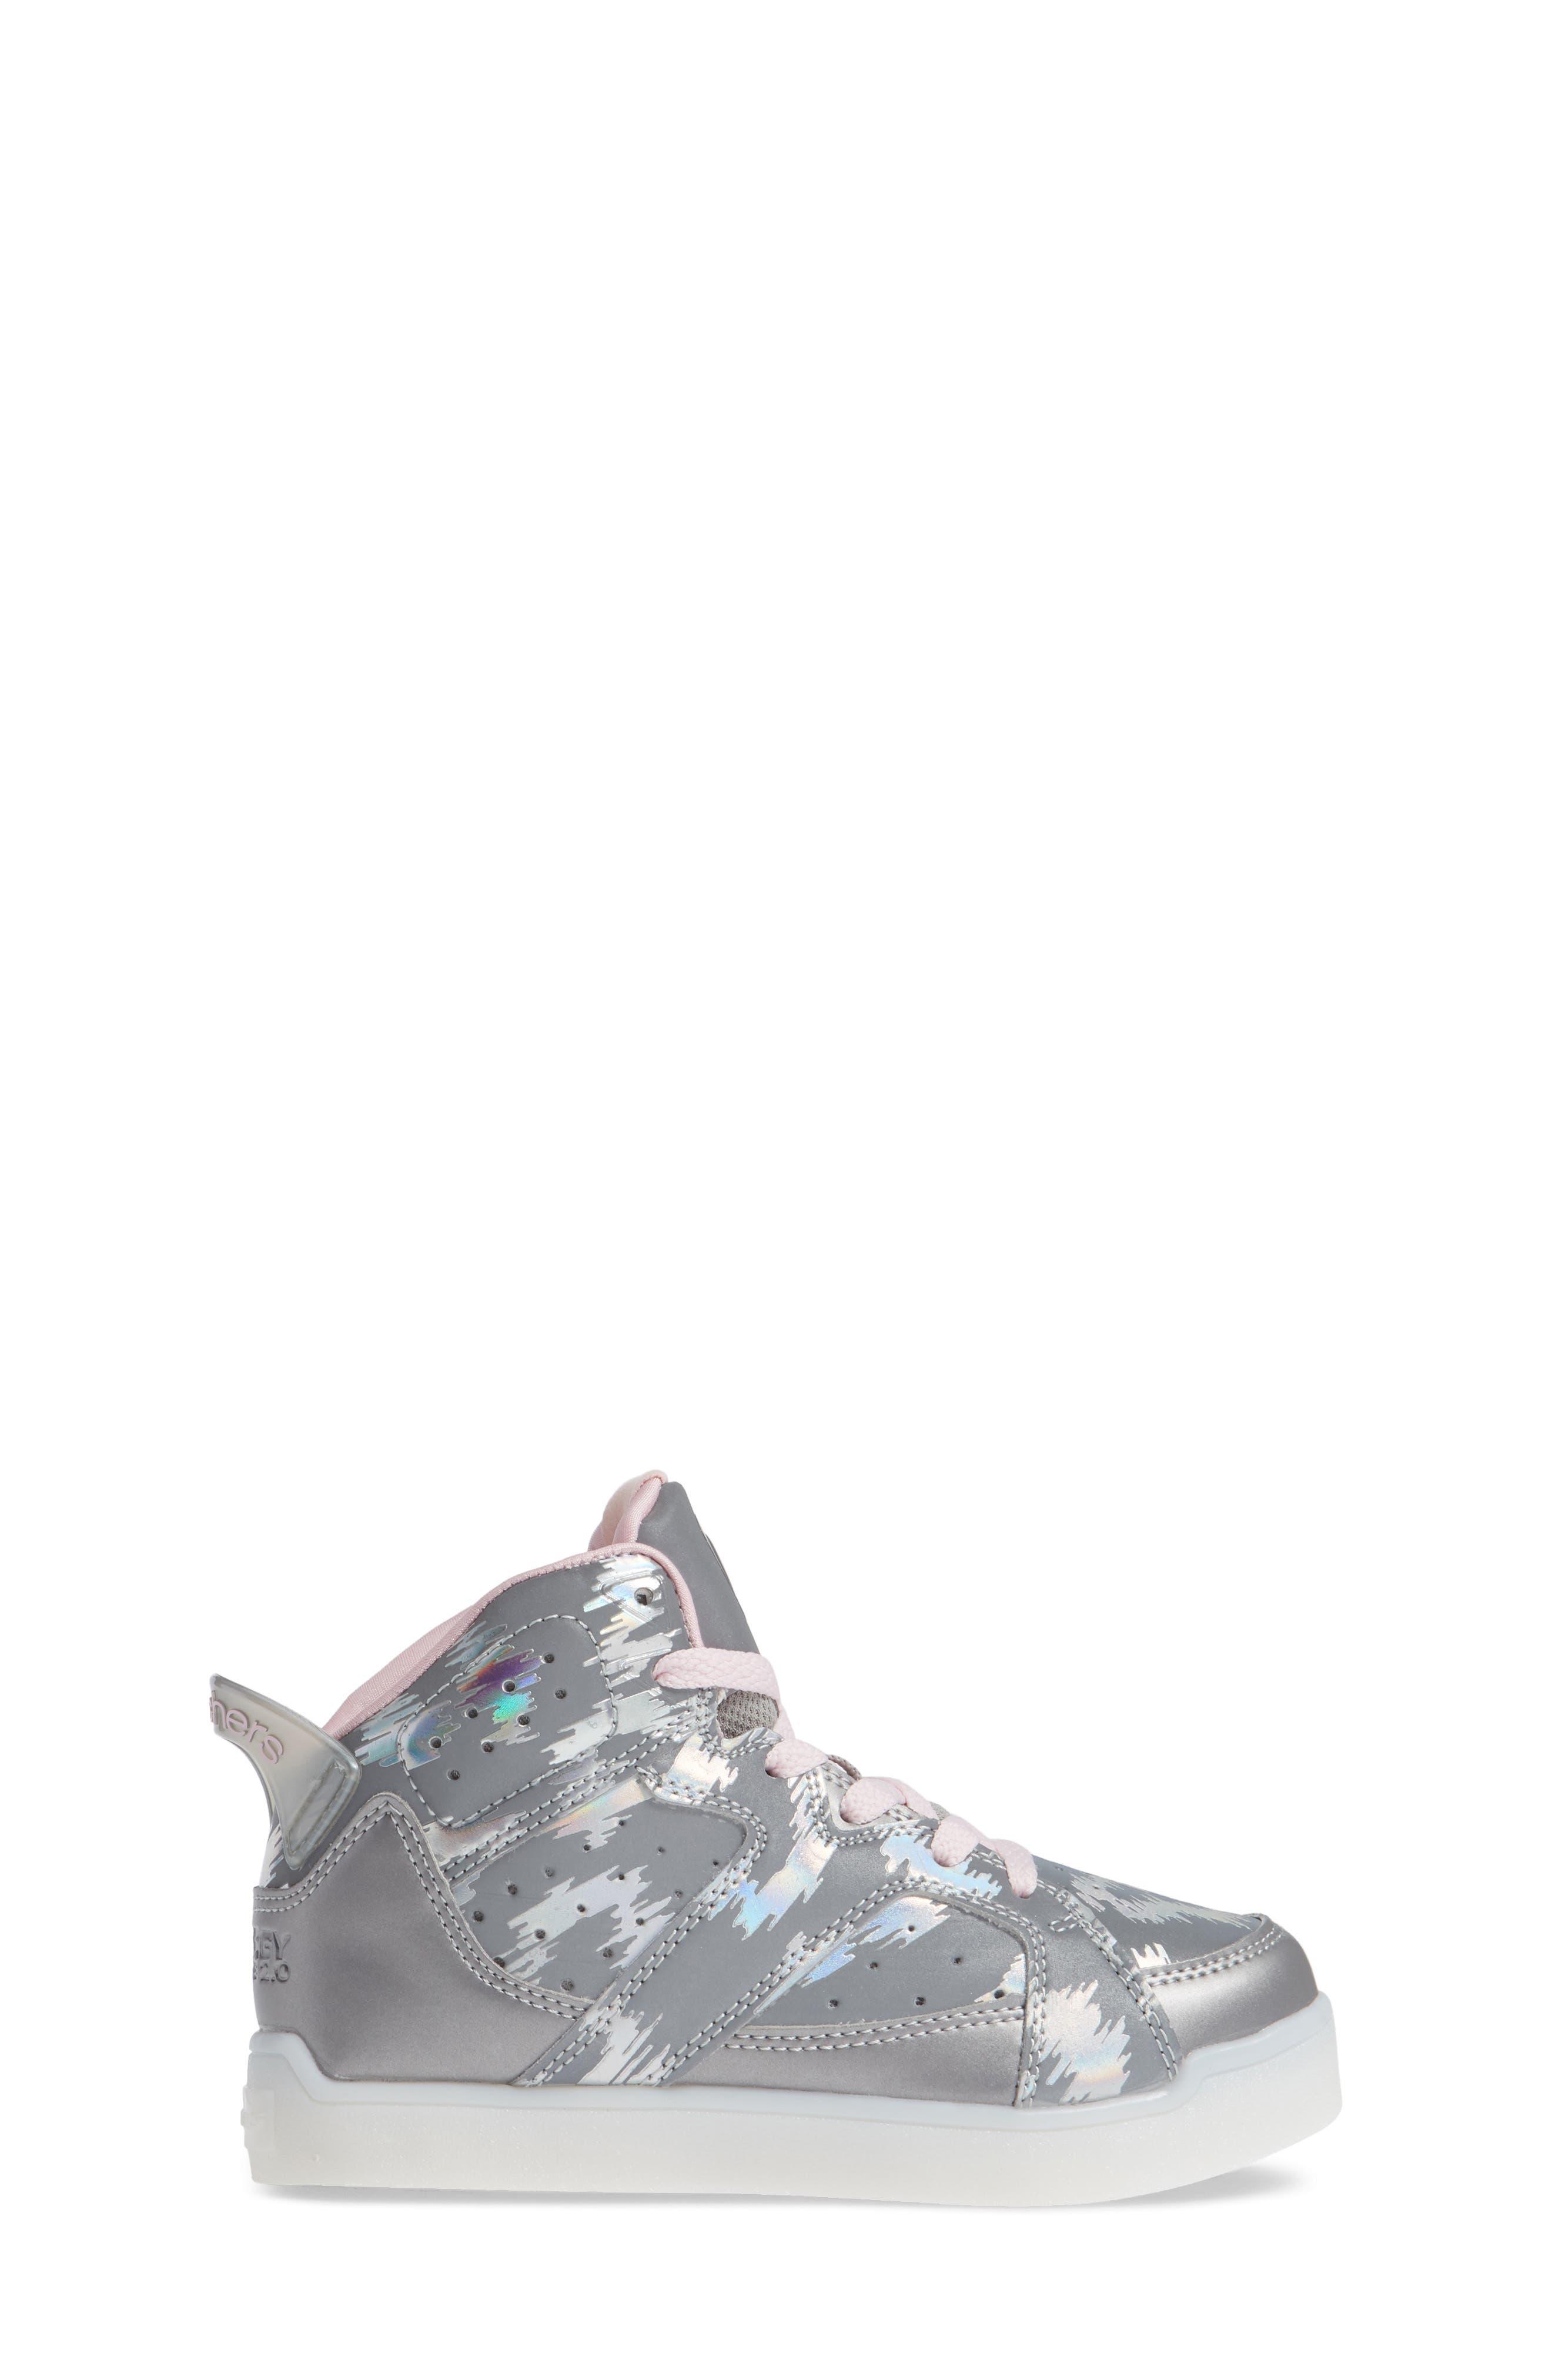 Energy Lights Pro Reflecti-Fab Sneaker,                             Alternate thumbnail 3, color,                             SILVER